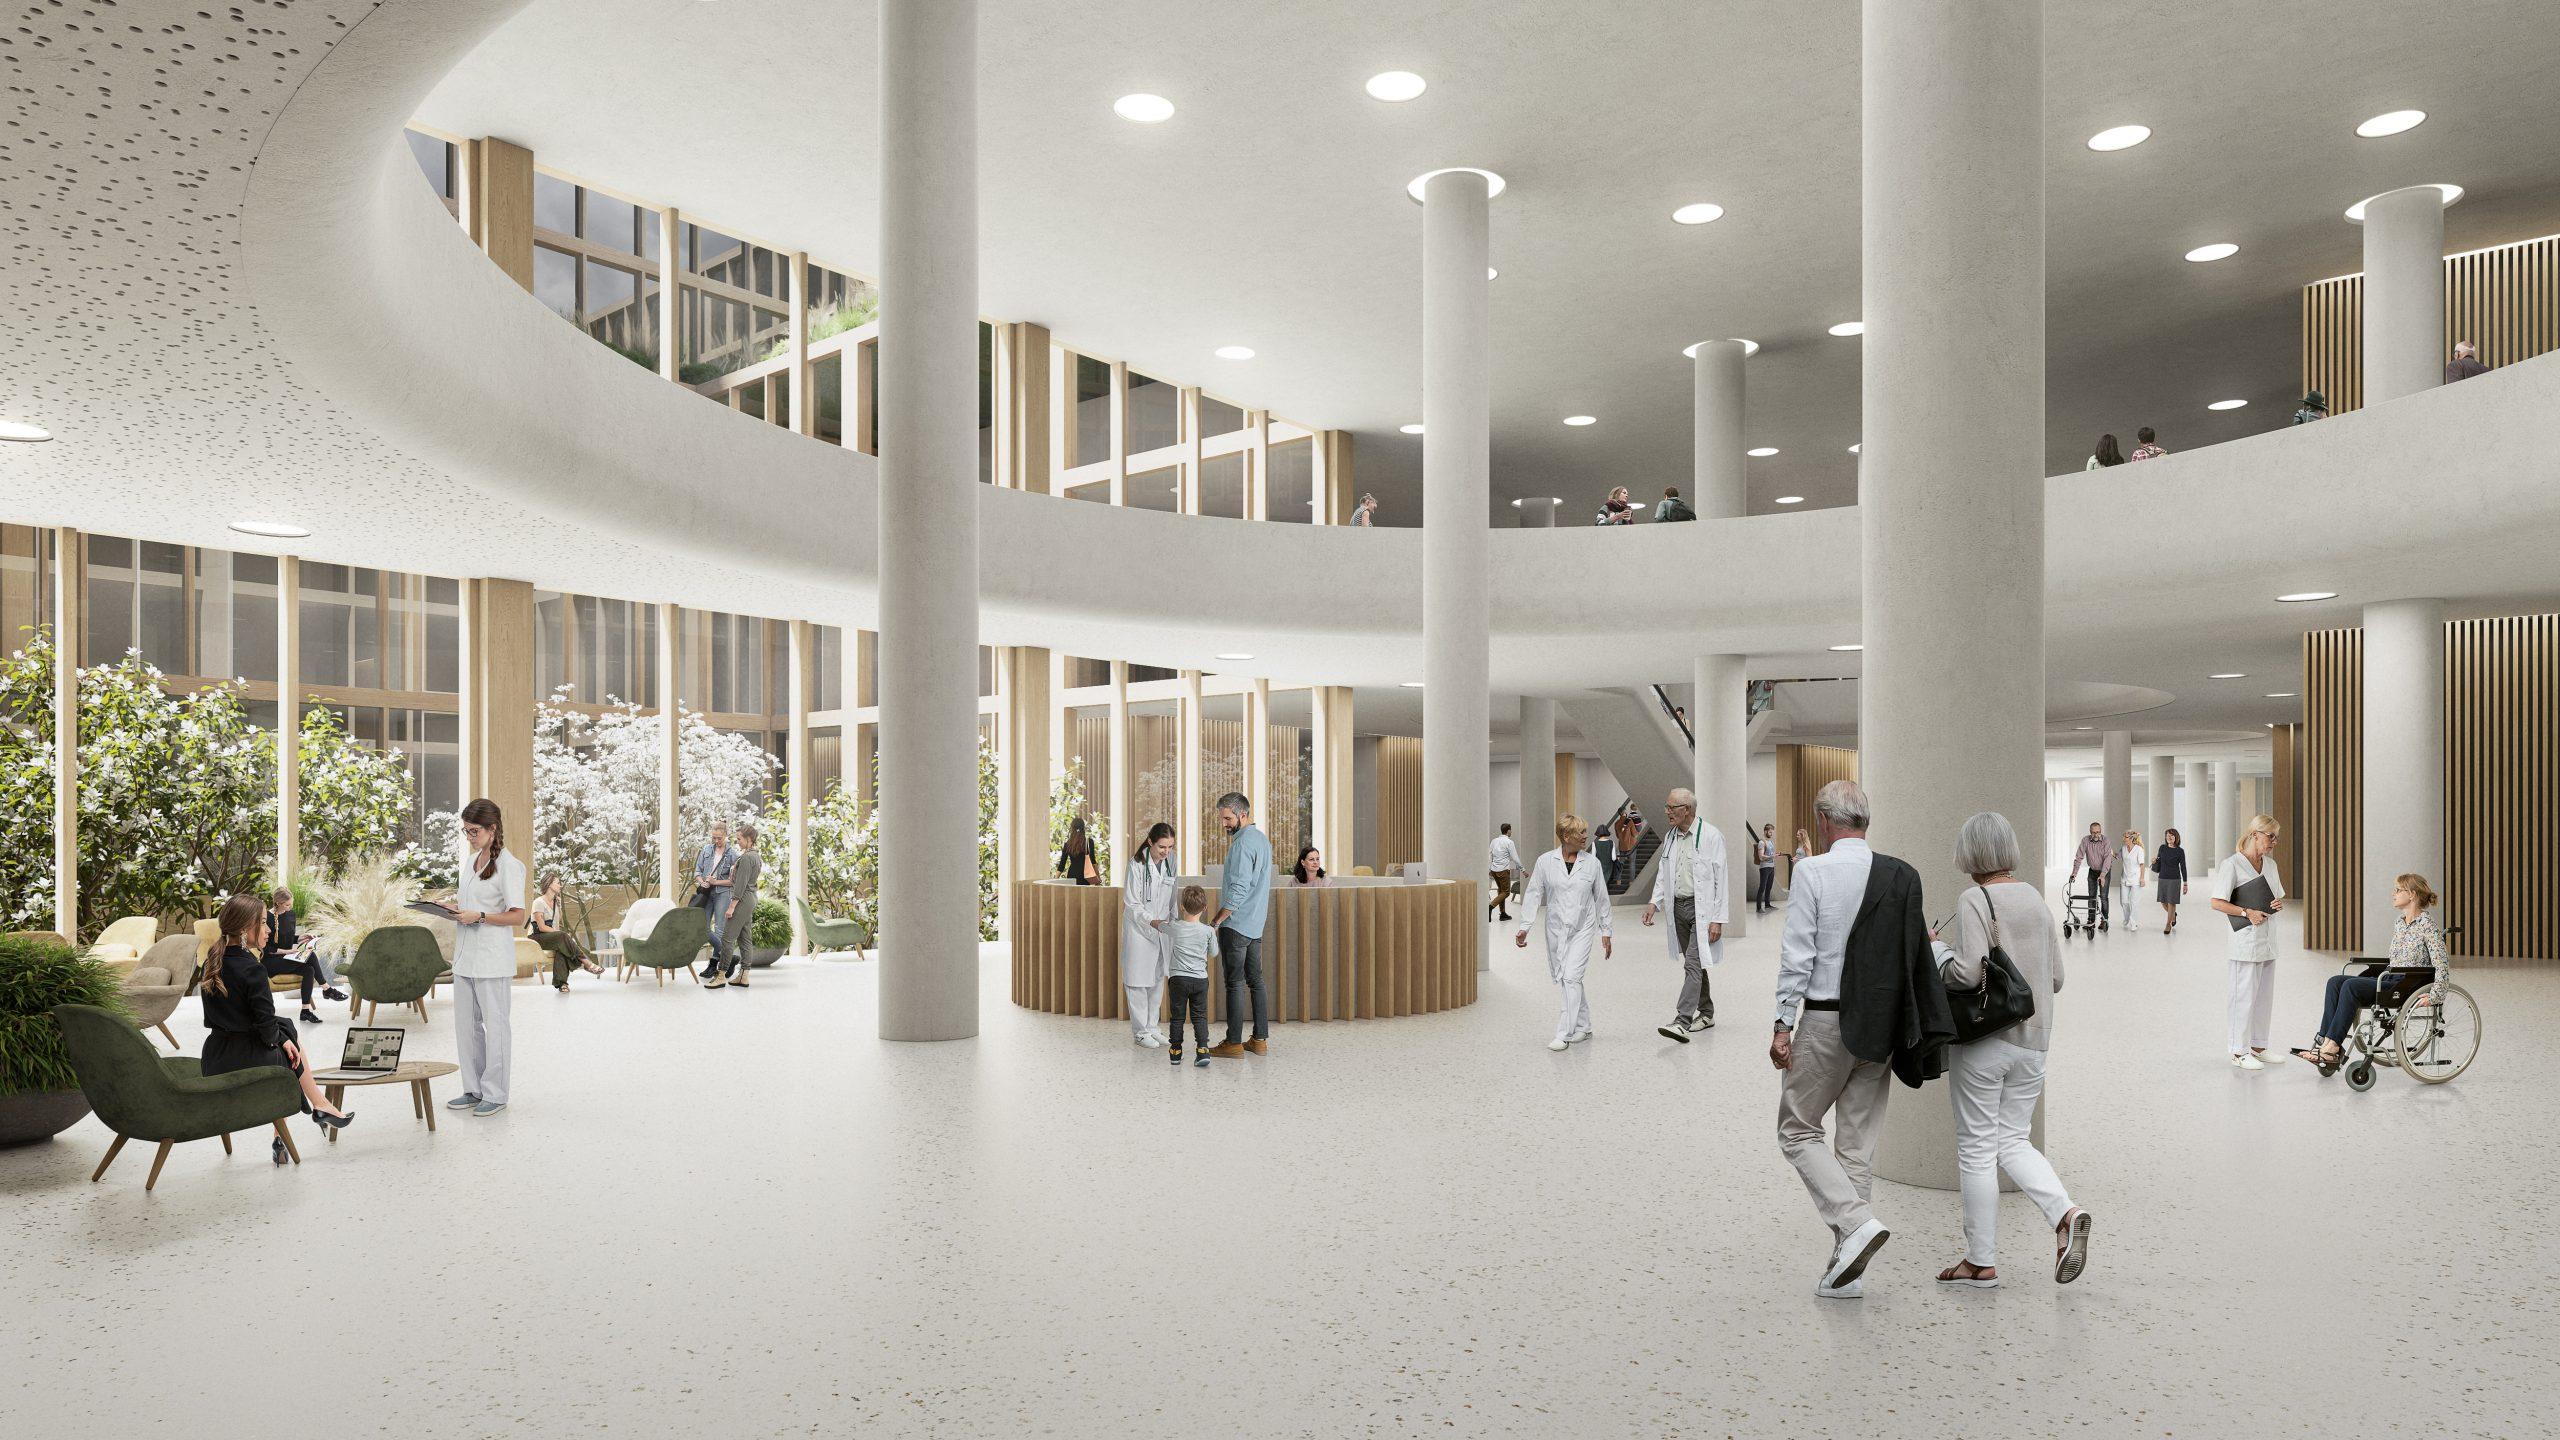 2020-10-Pantograph-Martin-Interier_foyer_final-scaled-1